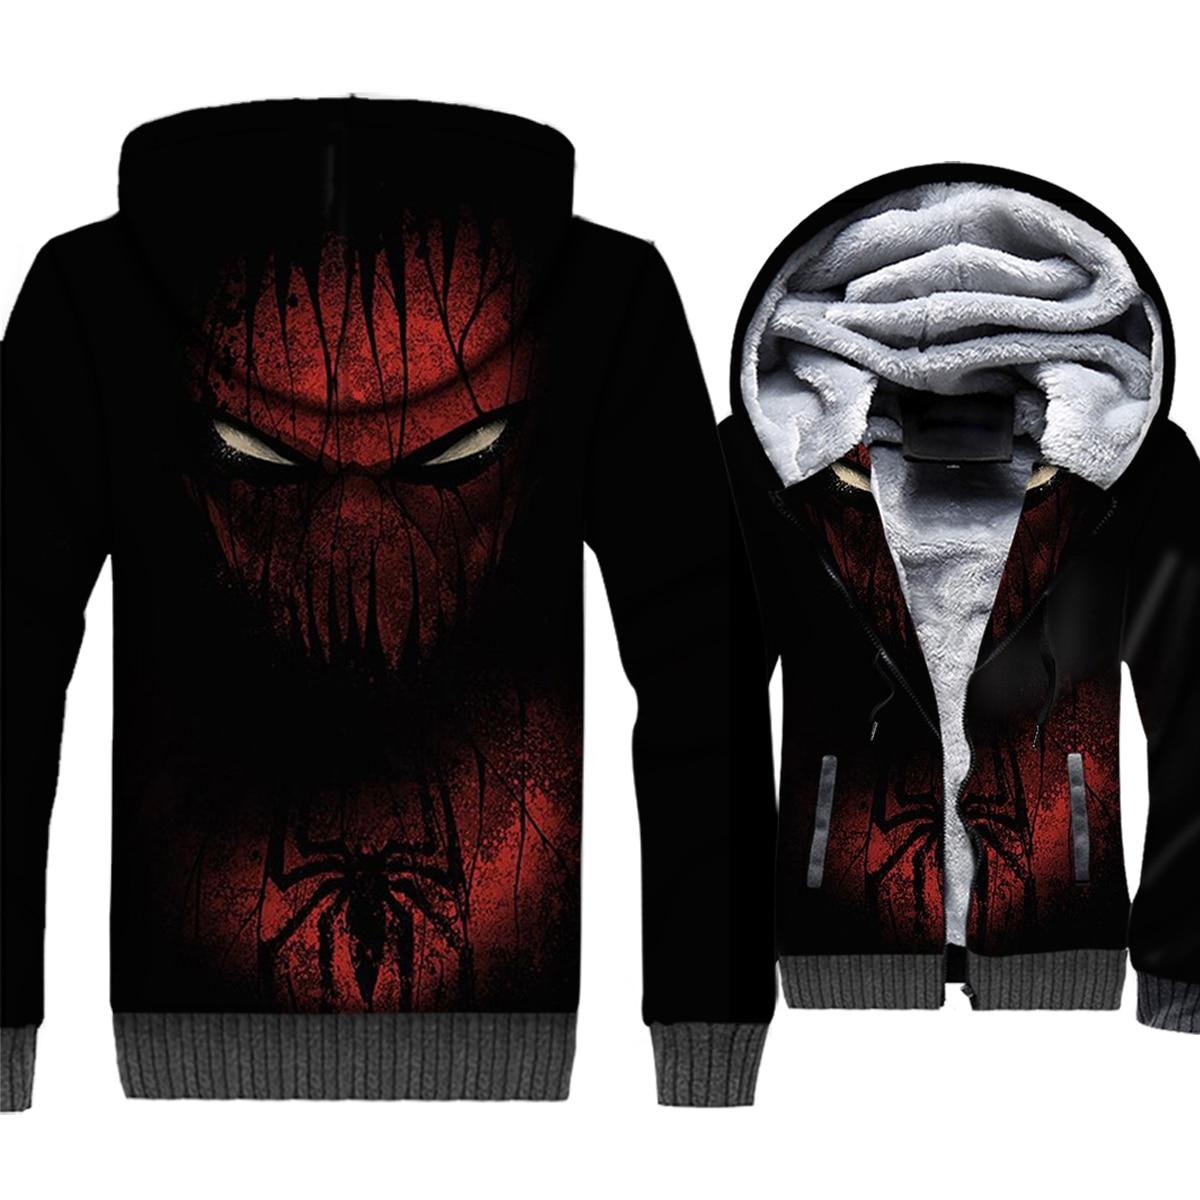 2018 Autumn Winter Thick Hoodies For Men 3D Pattern Jacket Super Hero Spiderman Streetwear Men's Sweatshirts Hip Hip Swag Hoodie